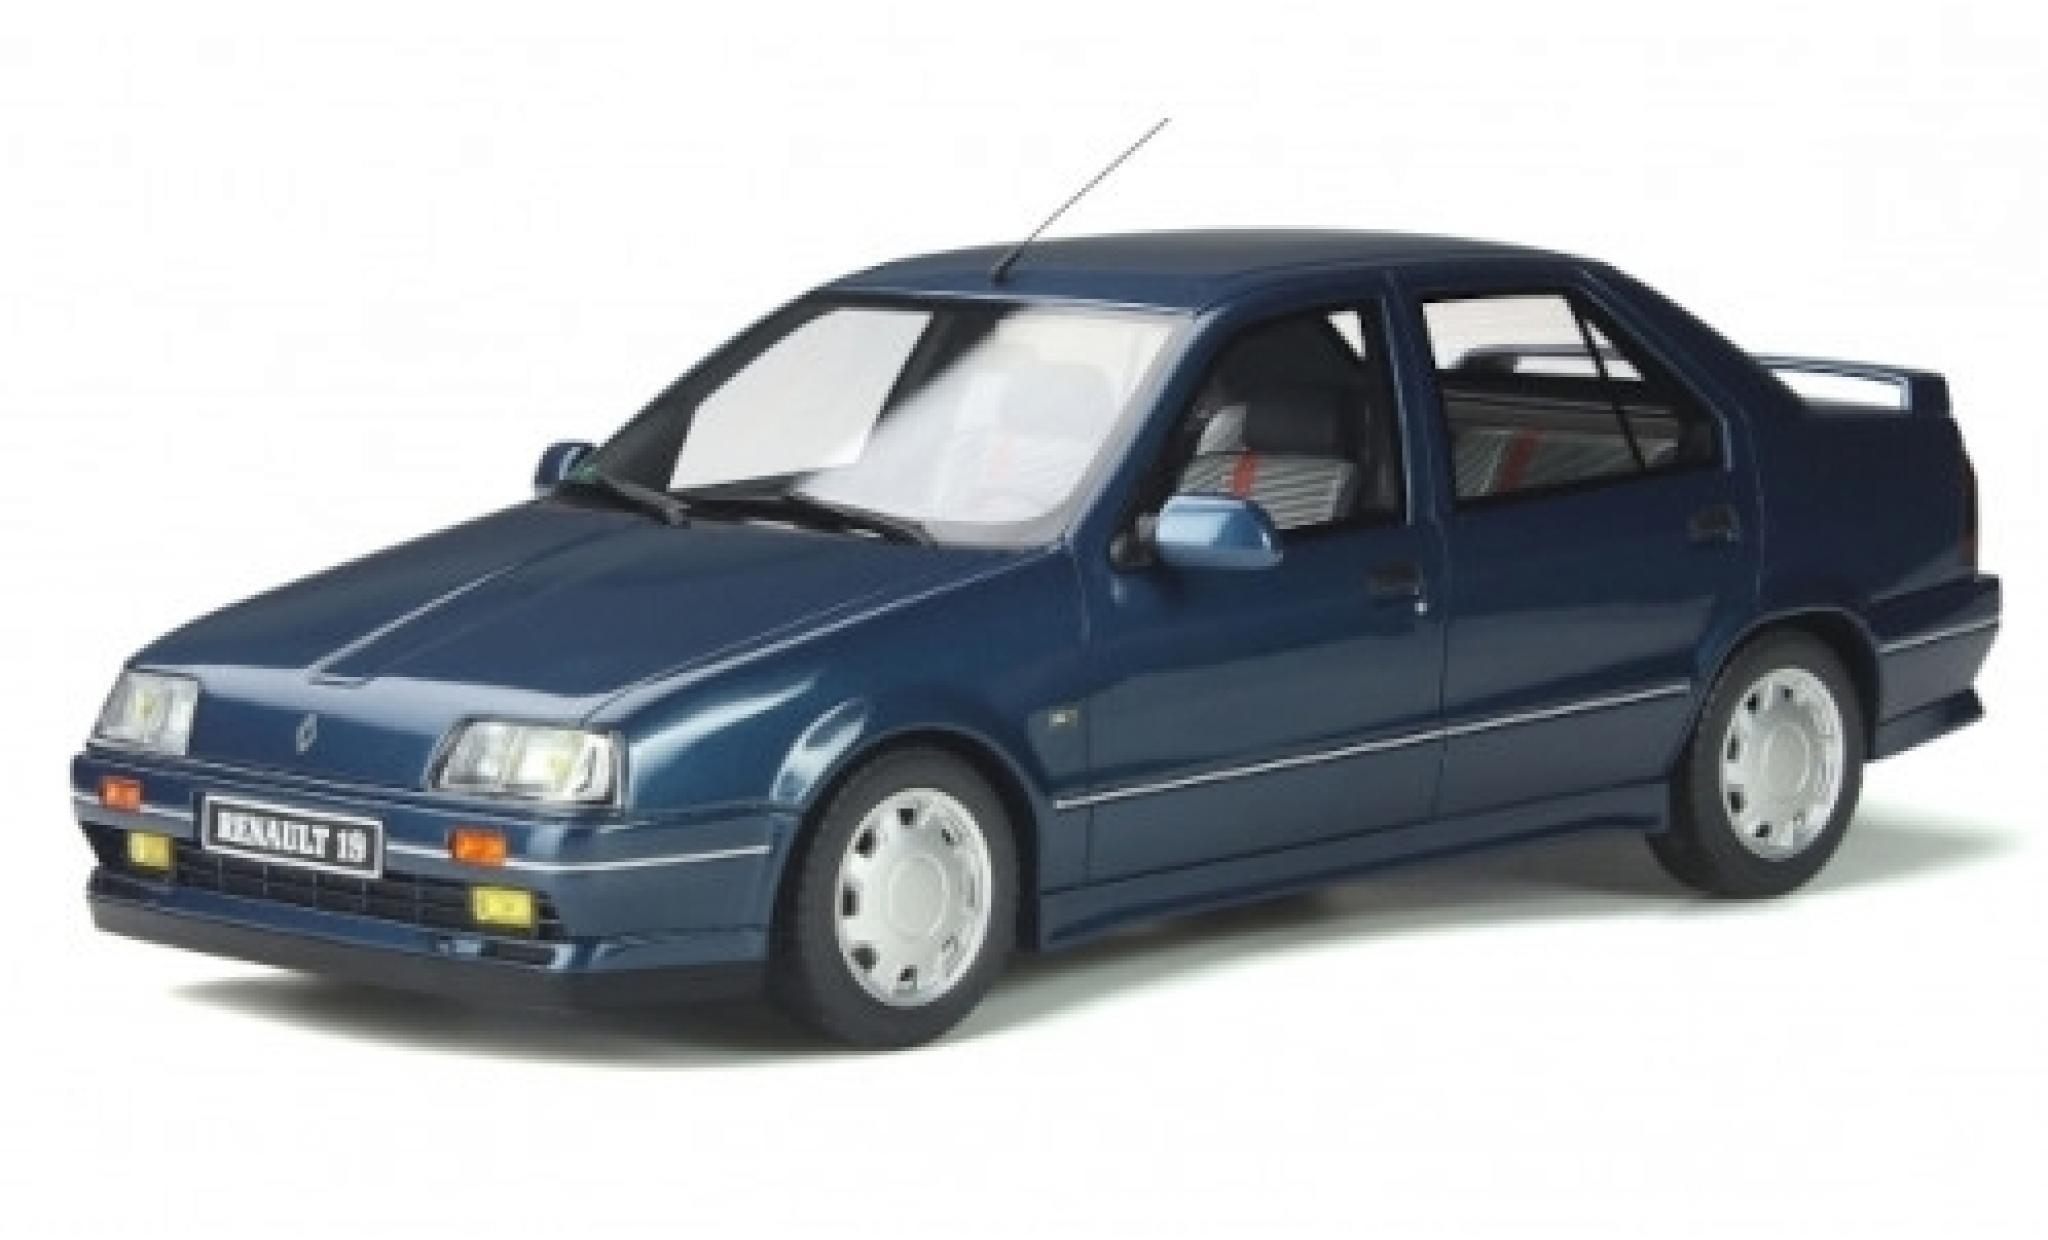 Renault 19 1/18 Ottomobile Chamade 16S Phase 1 metallise bleue 89